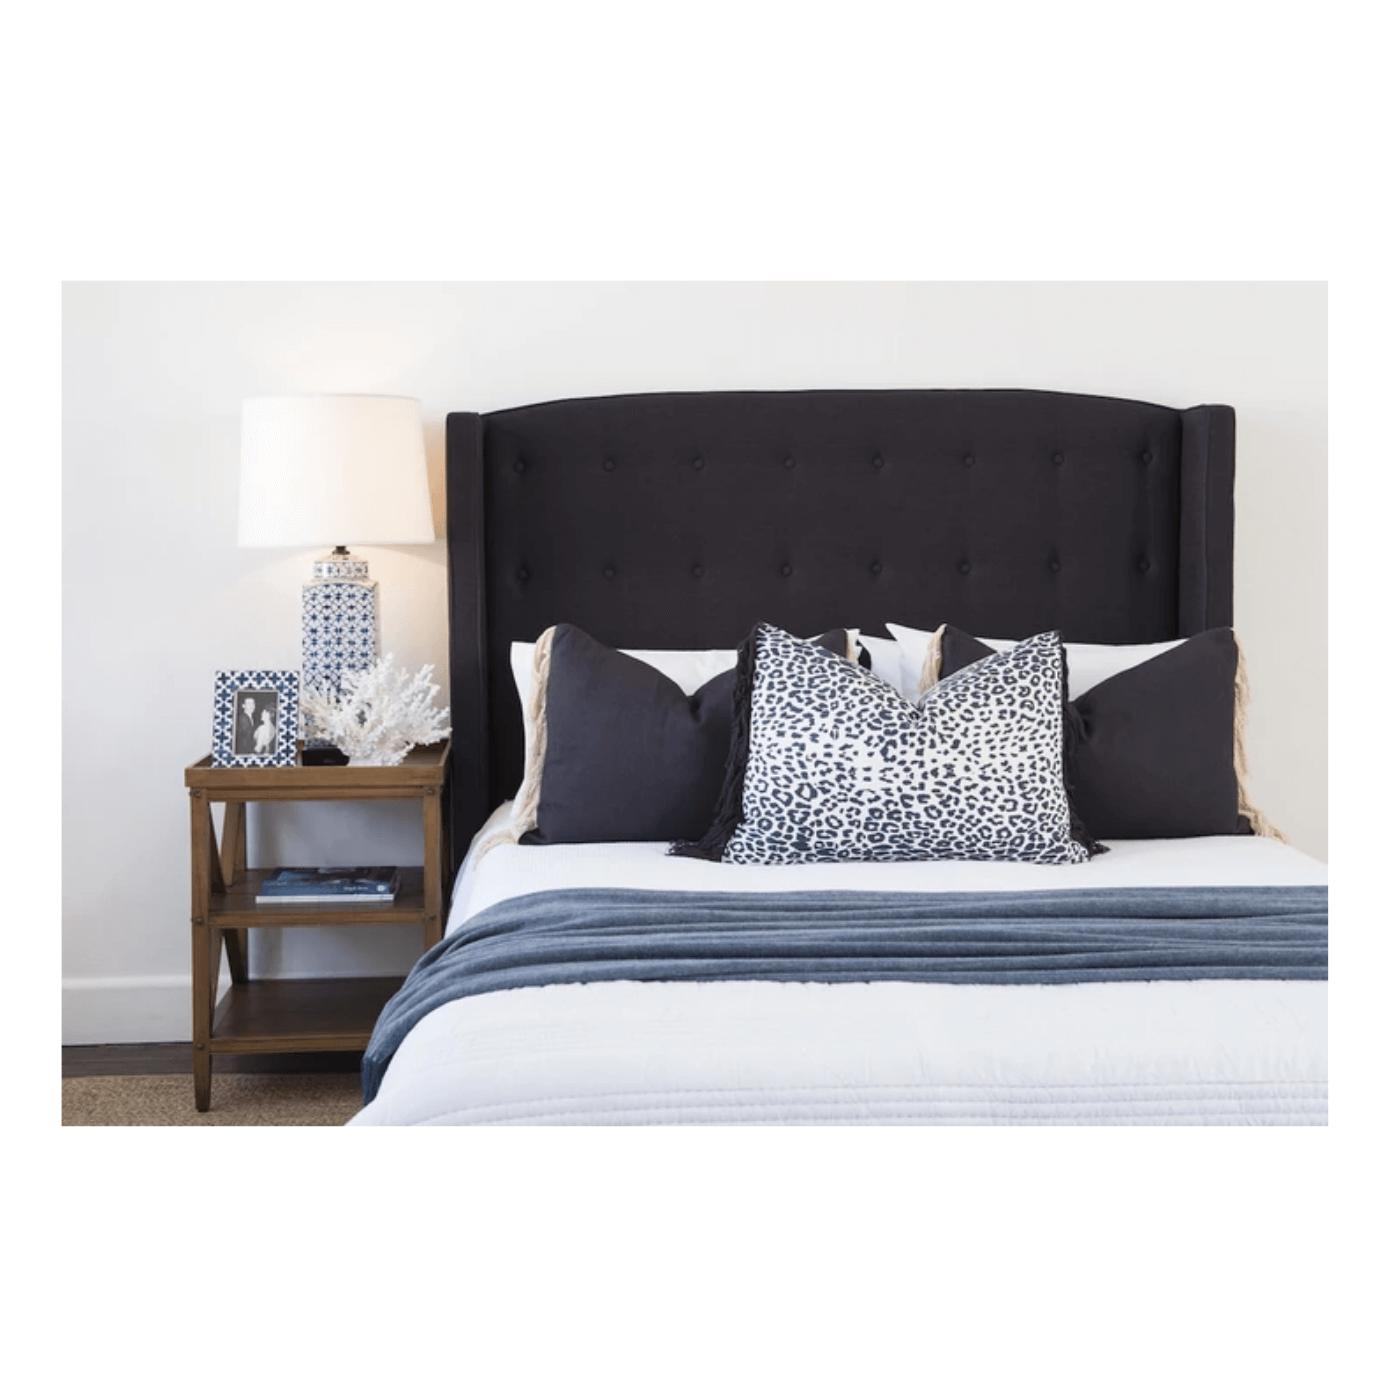 Two-Design-Lovers-Mayvn-Interiors-Mackenzie-Bedhead-Ink